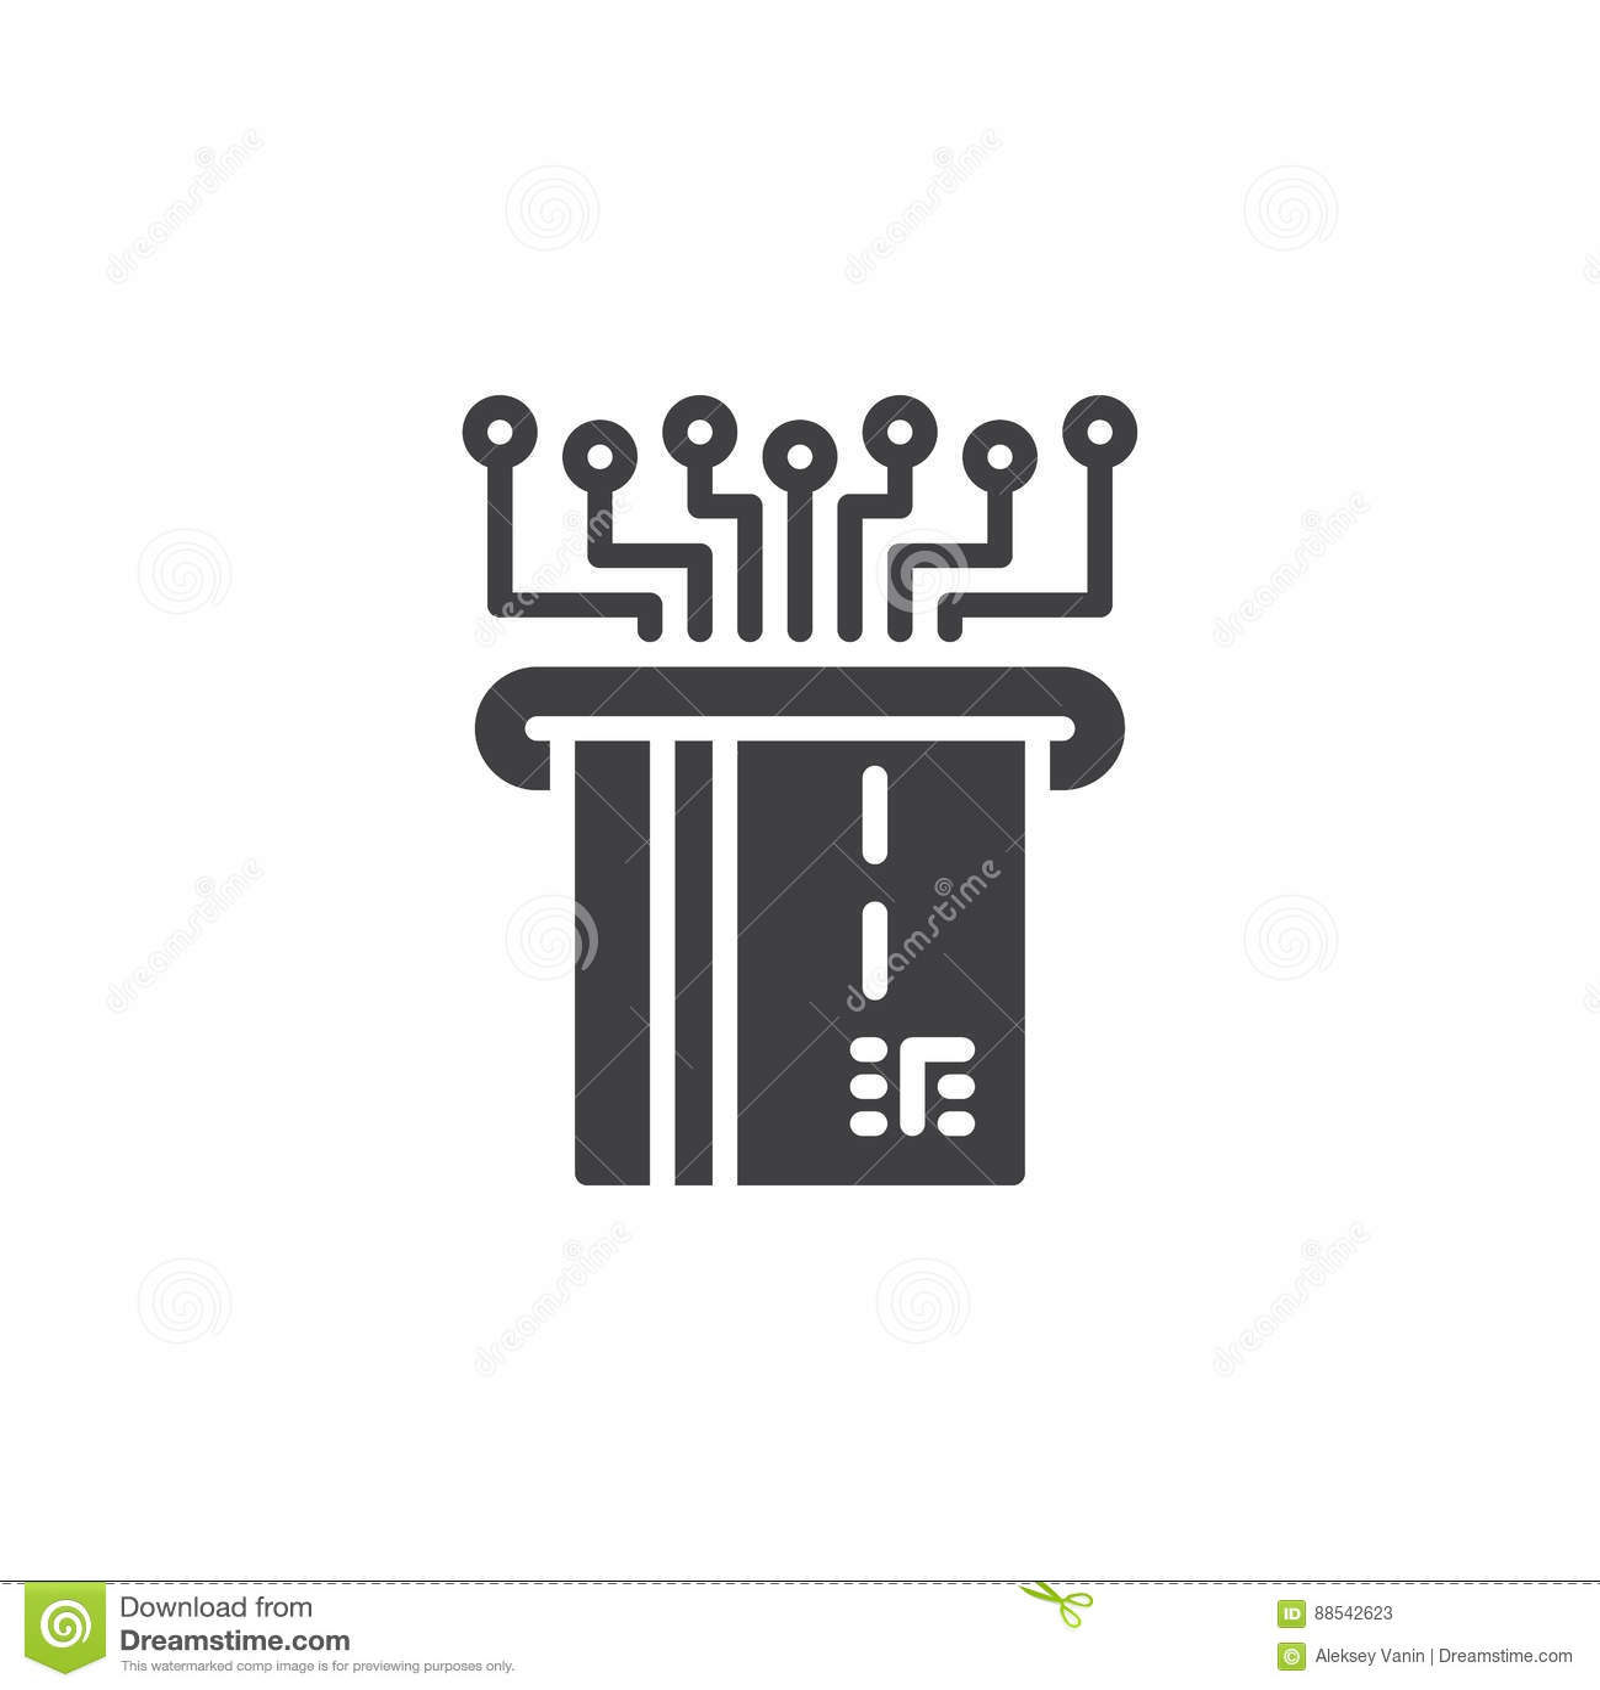 Dorable Schematic Symbol For Solenoid Model - Wiring Diagram Ideas ...